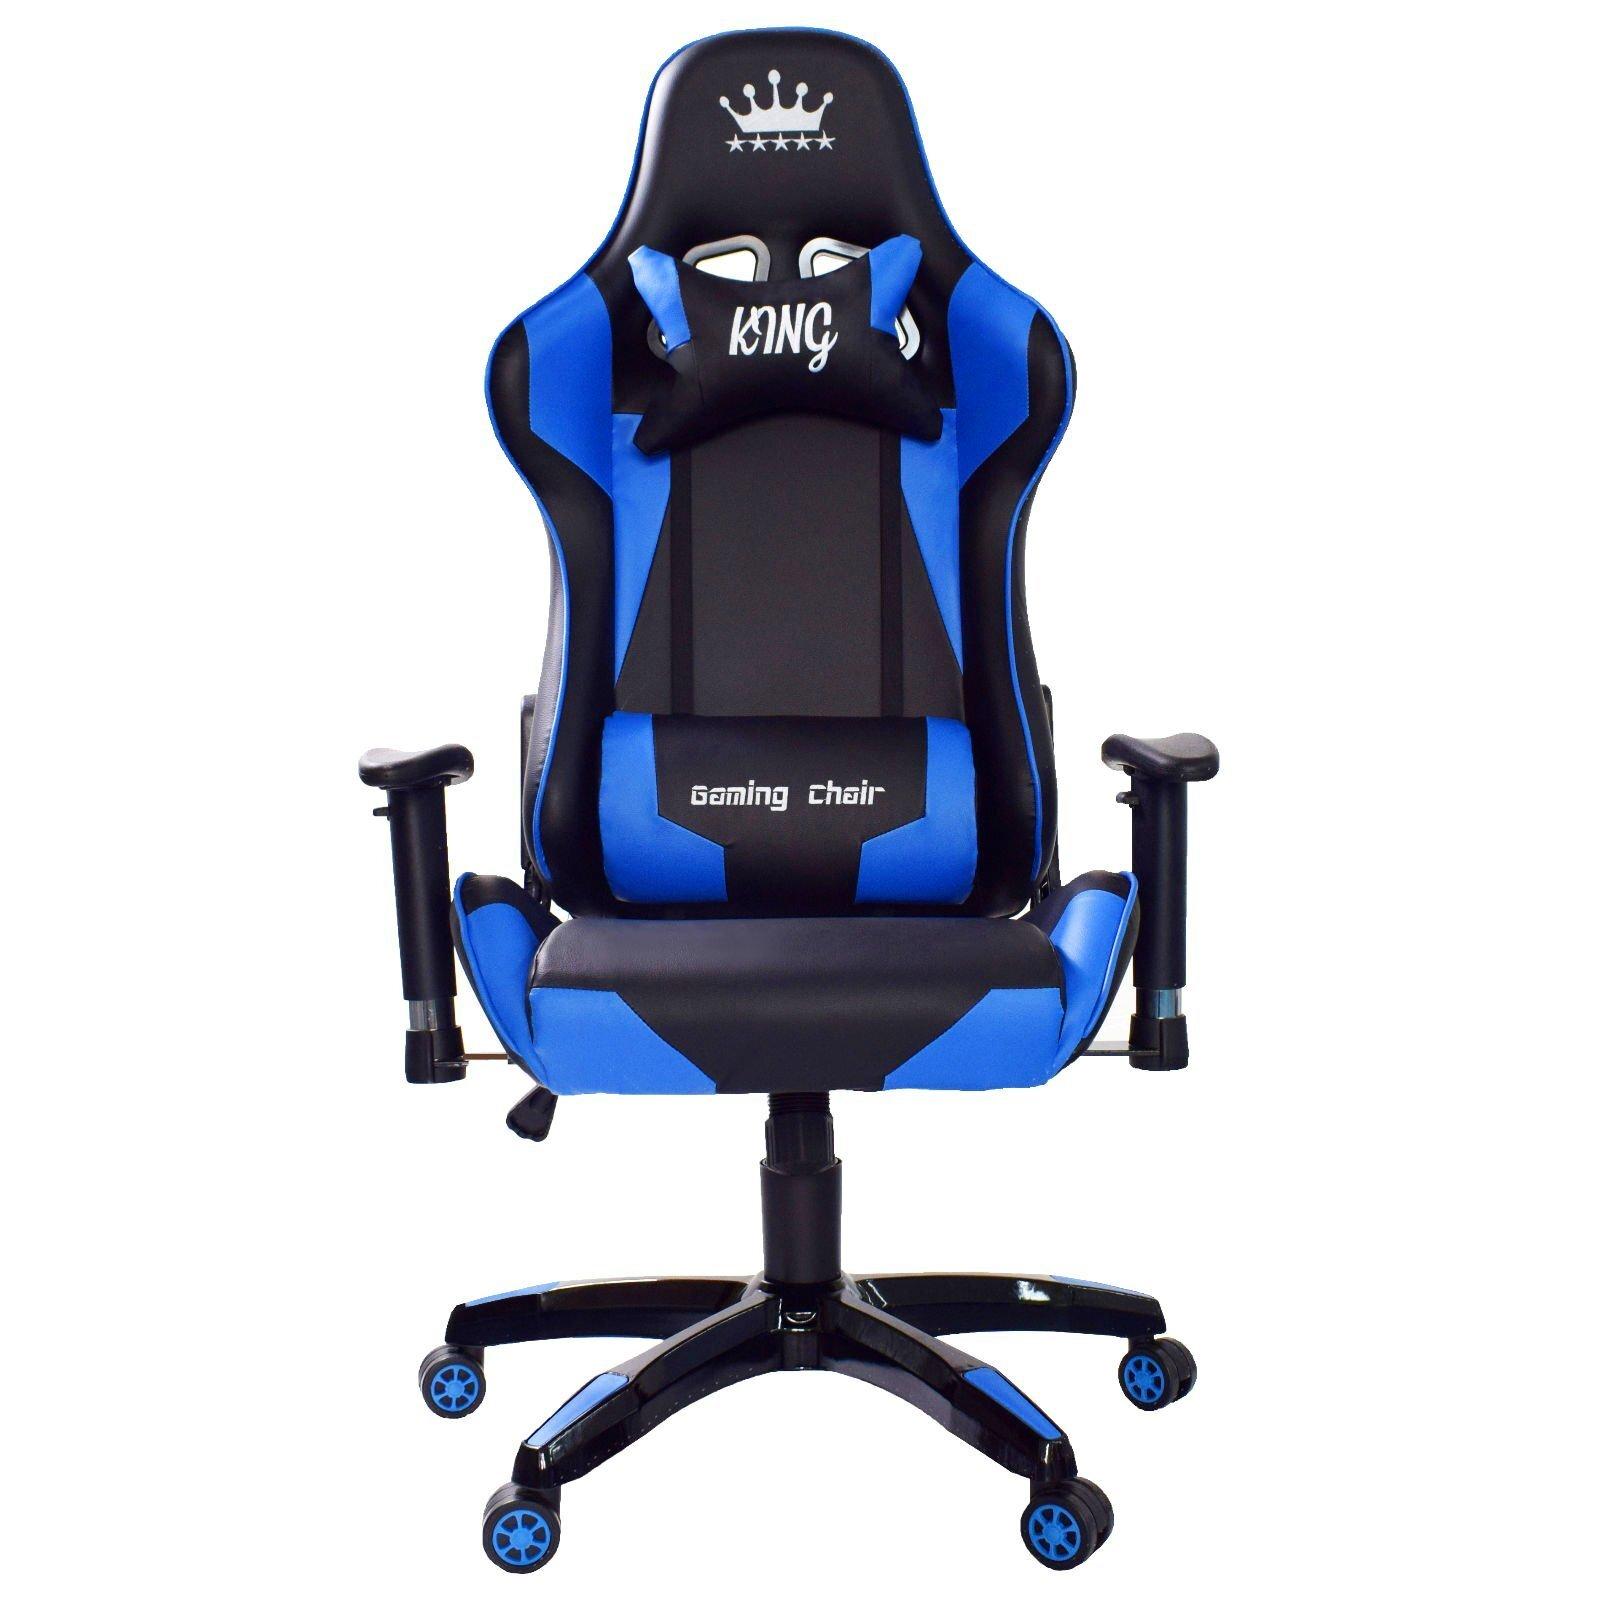 Midori Gaming Chair in schwarz blau